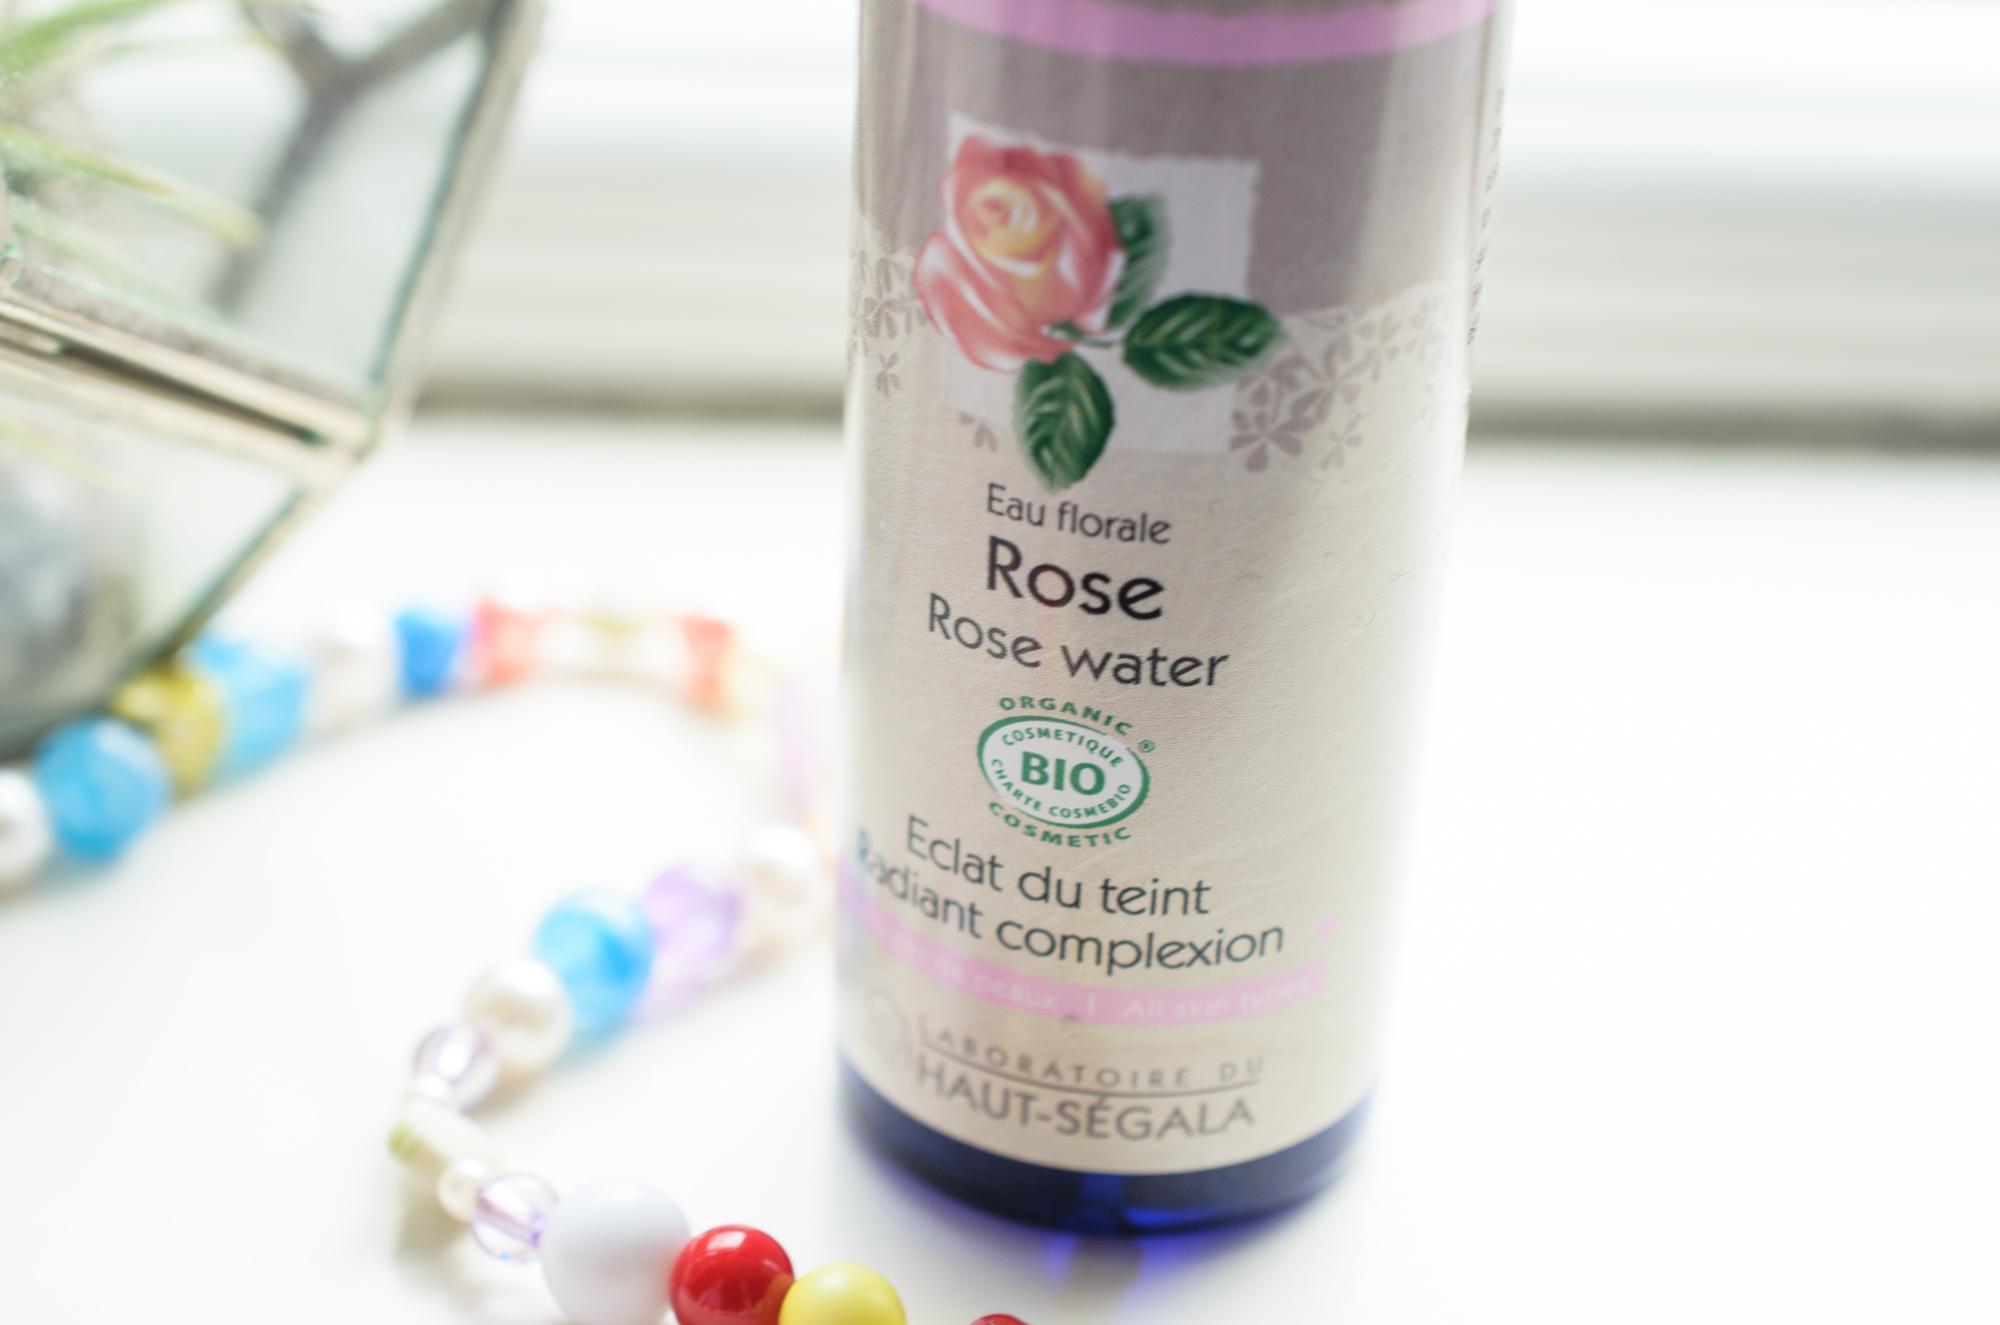 Laboratoire du Haut-Segala Rose Water